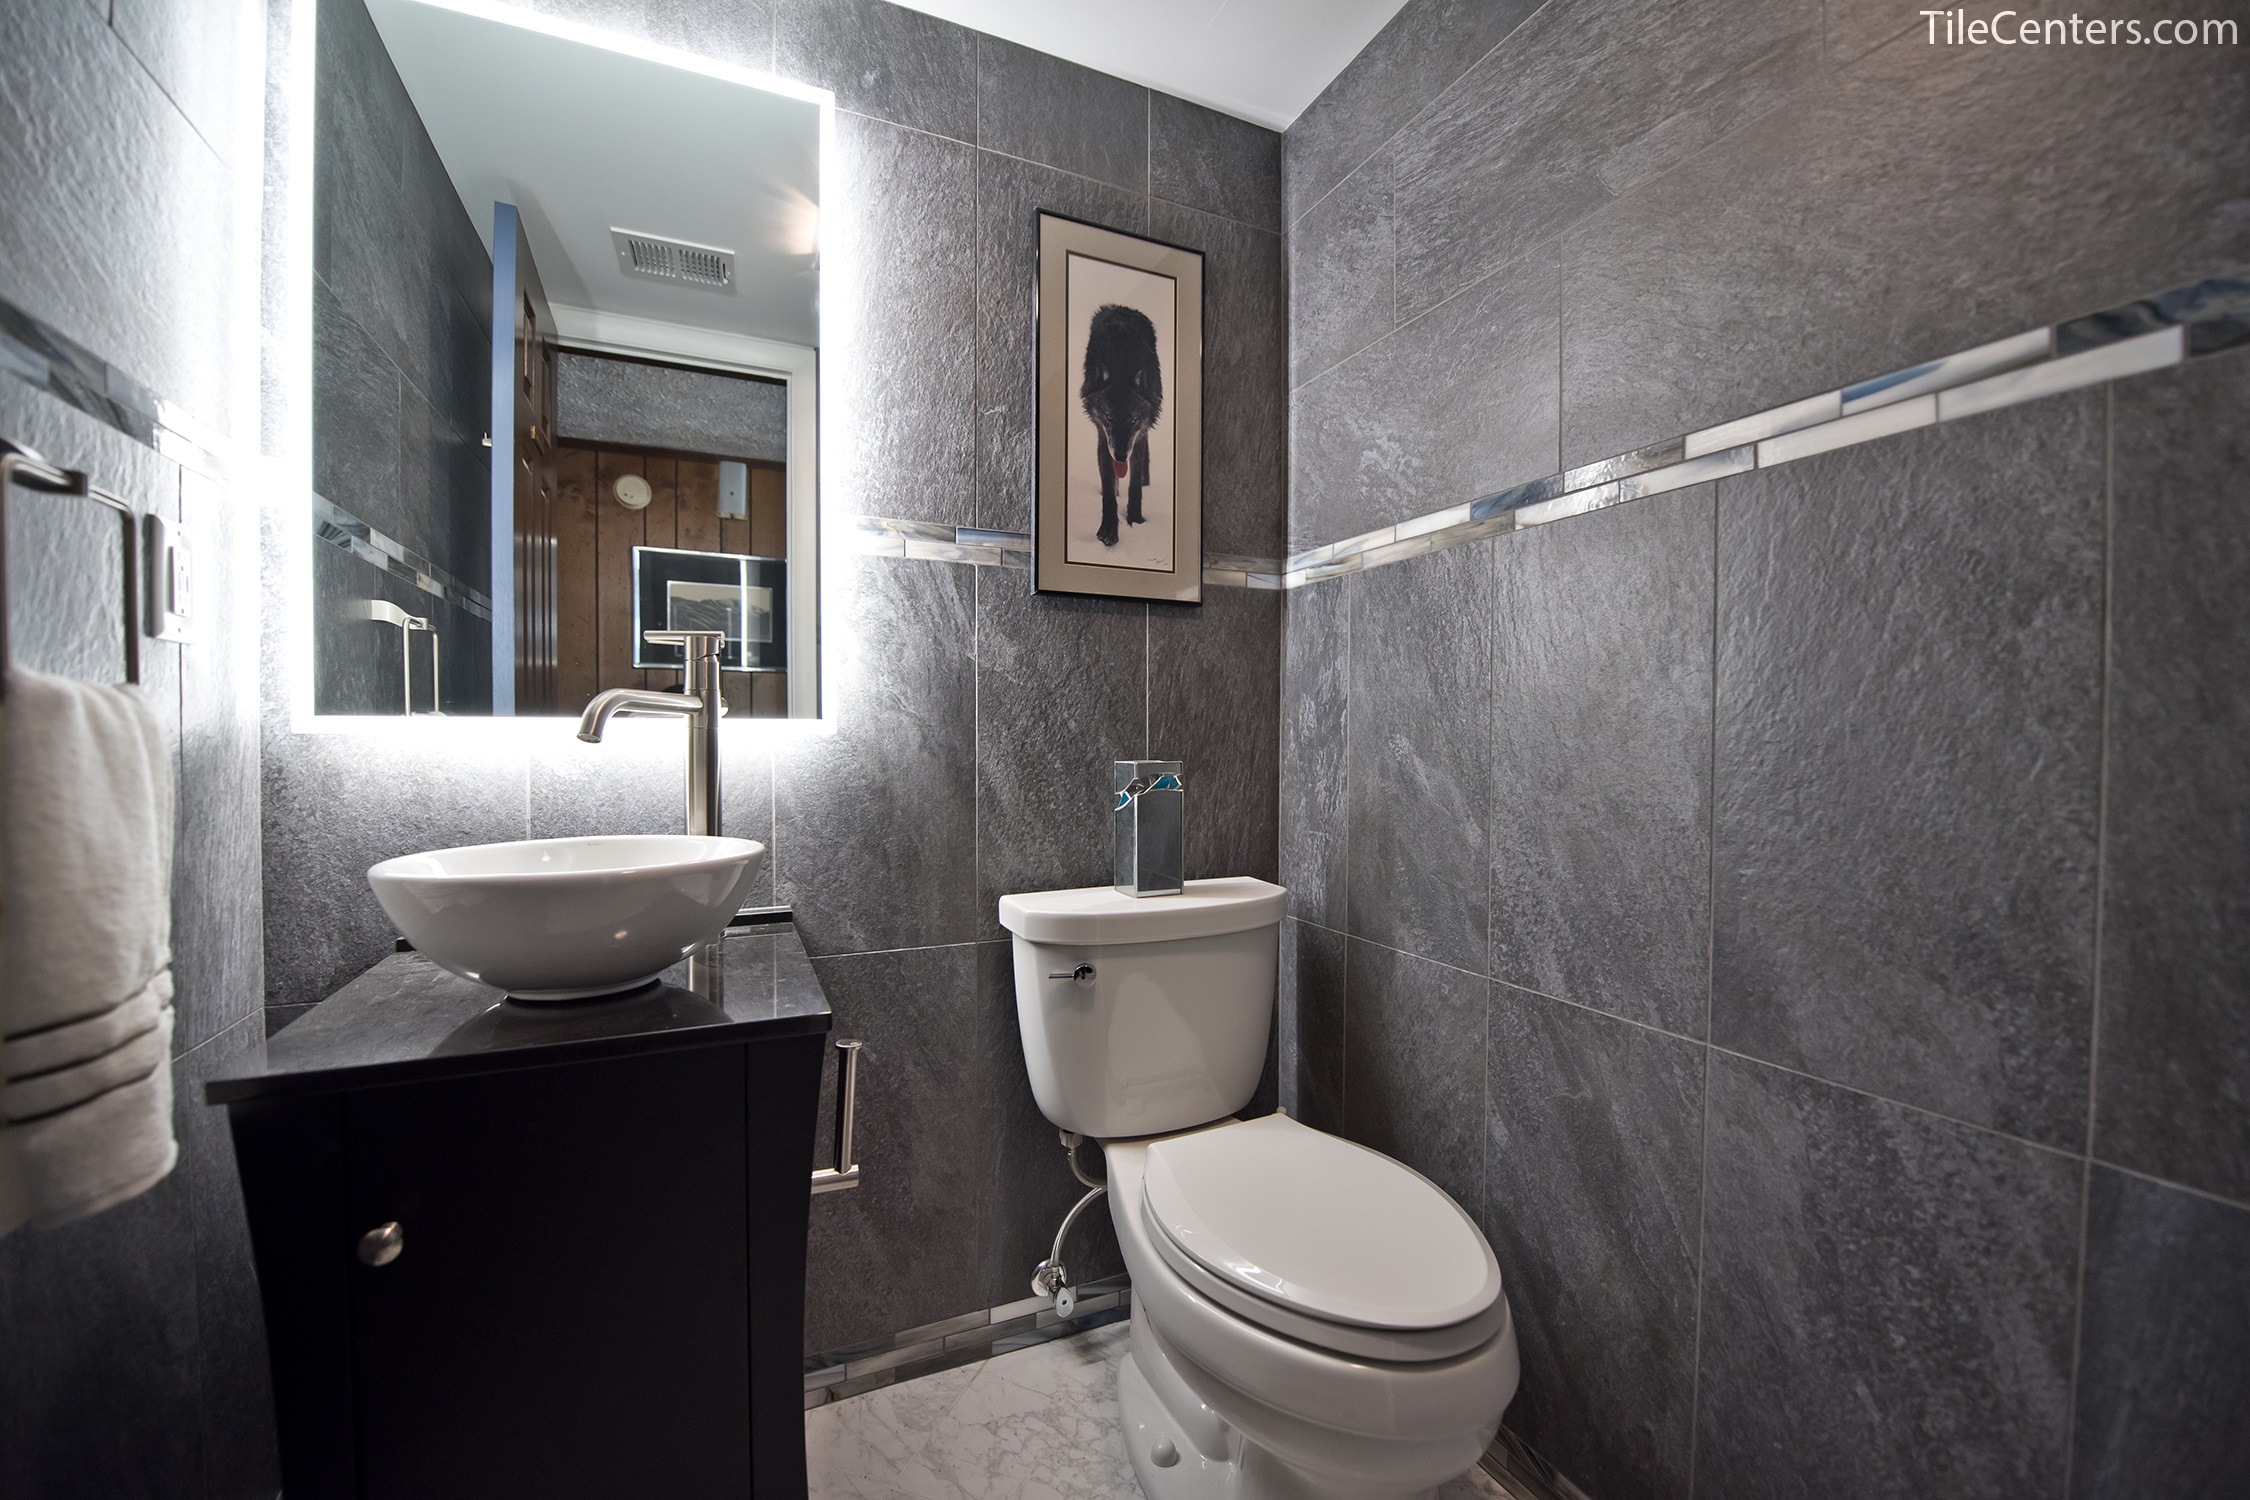 Bathroom farcroft terrace gaithersburg md 20882 tile - Bathroom remodeling gaithersburg md ...